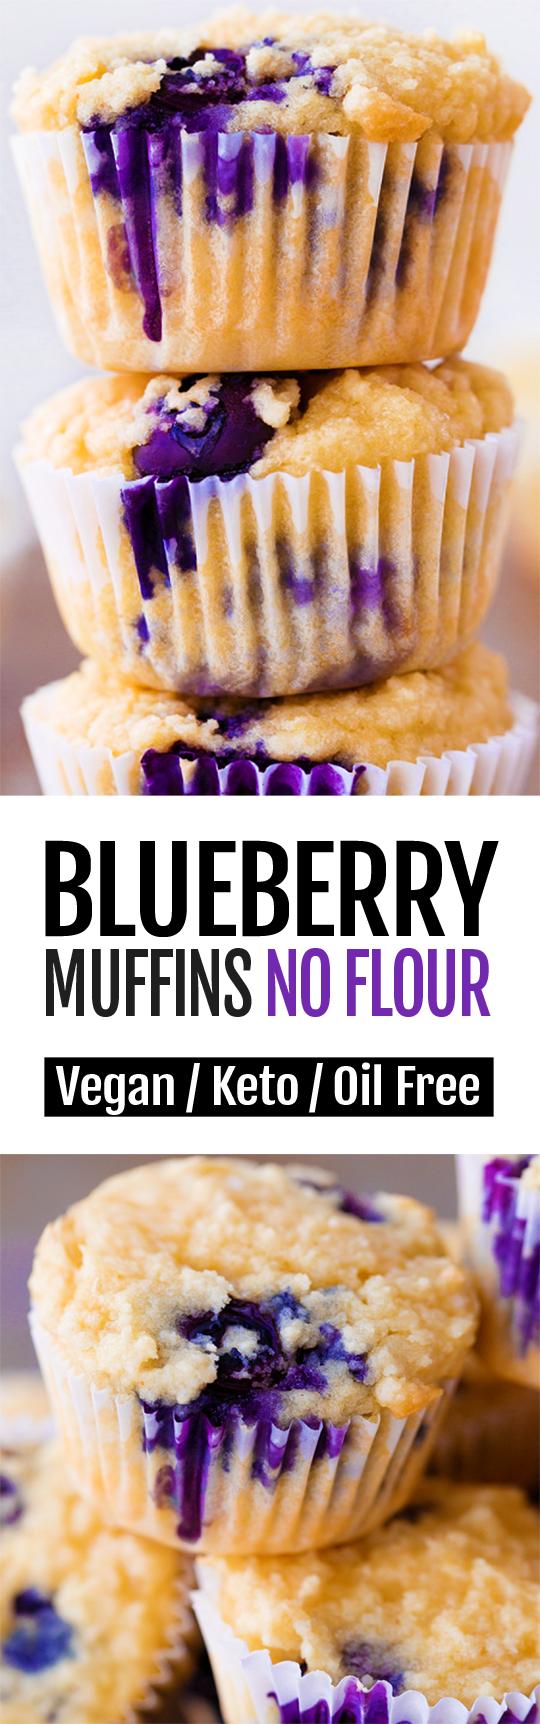 7 Ingredient Easy Keto Blueberry Muffins Recipe